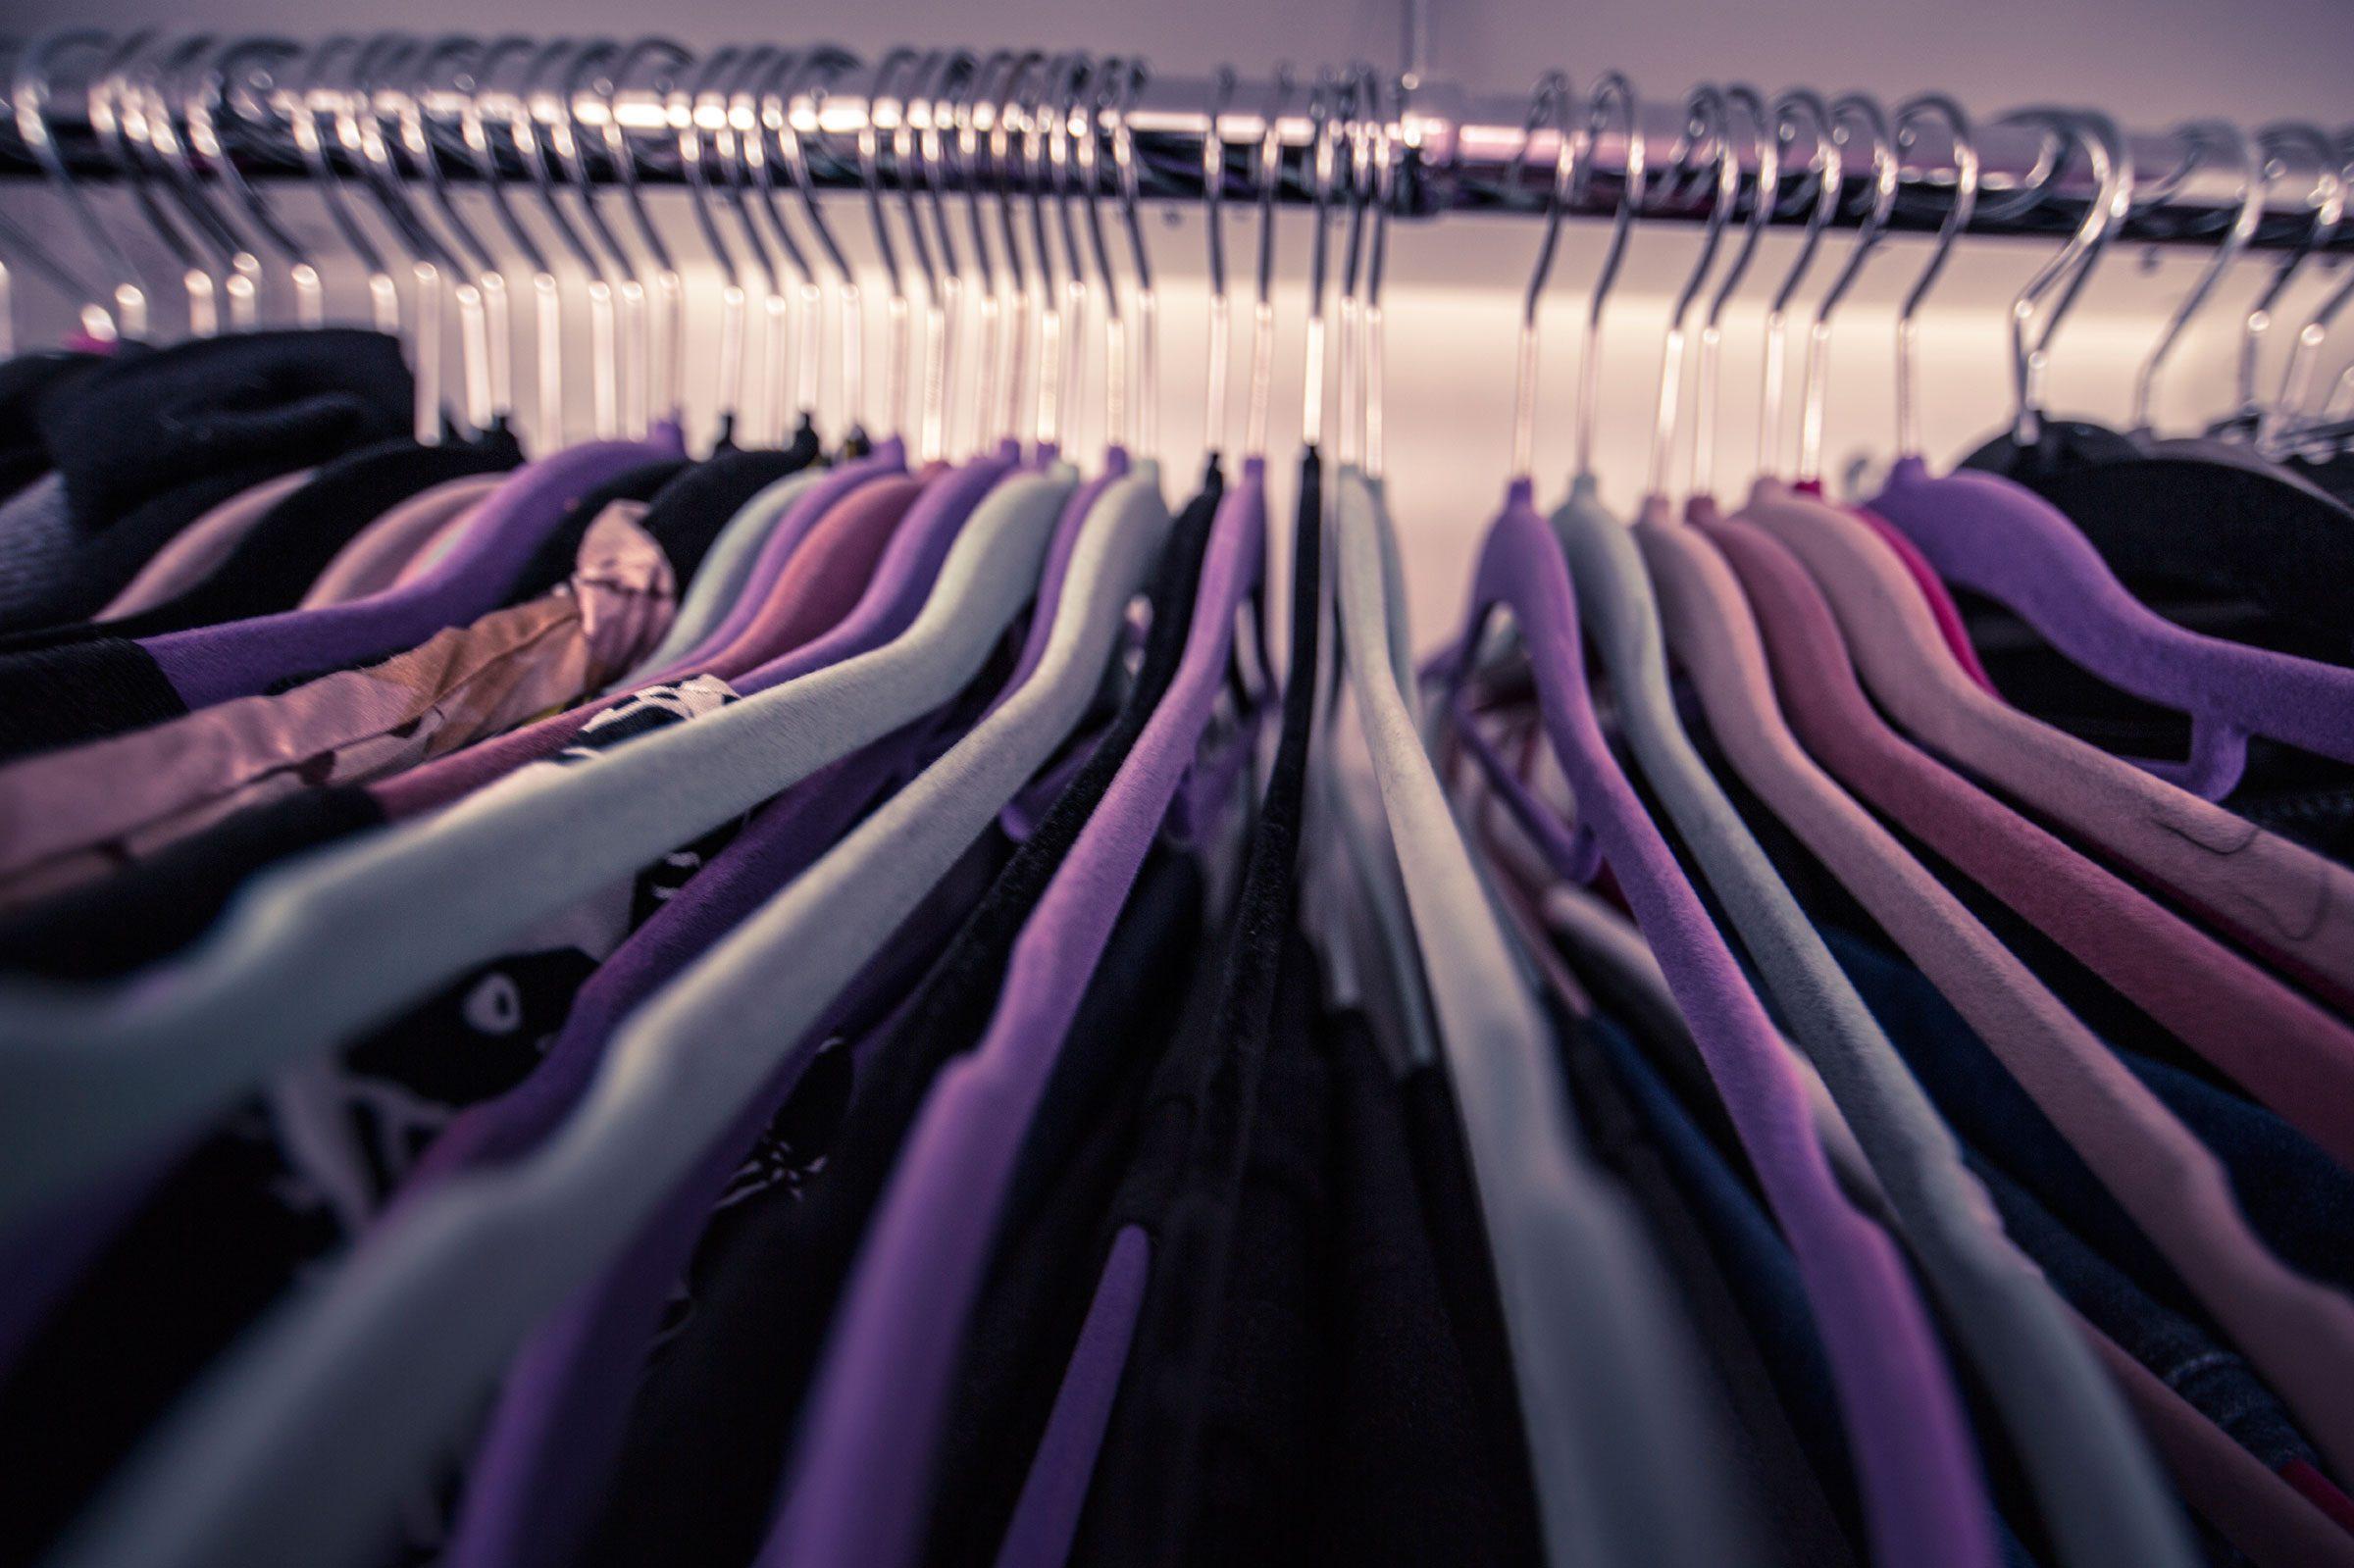 Hereu0027s A Simple Way To Transform Your Closet: